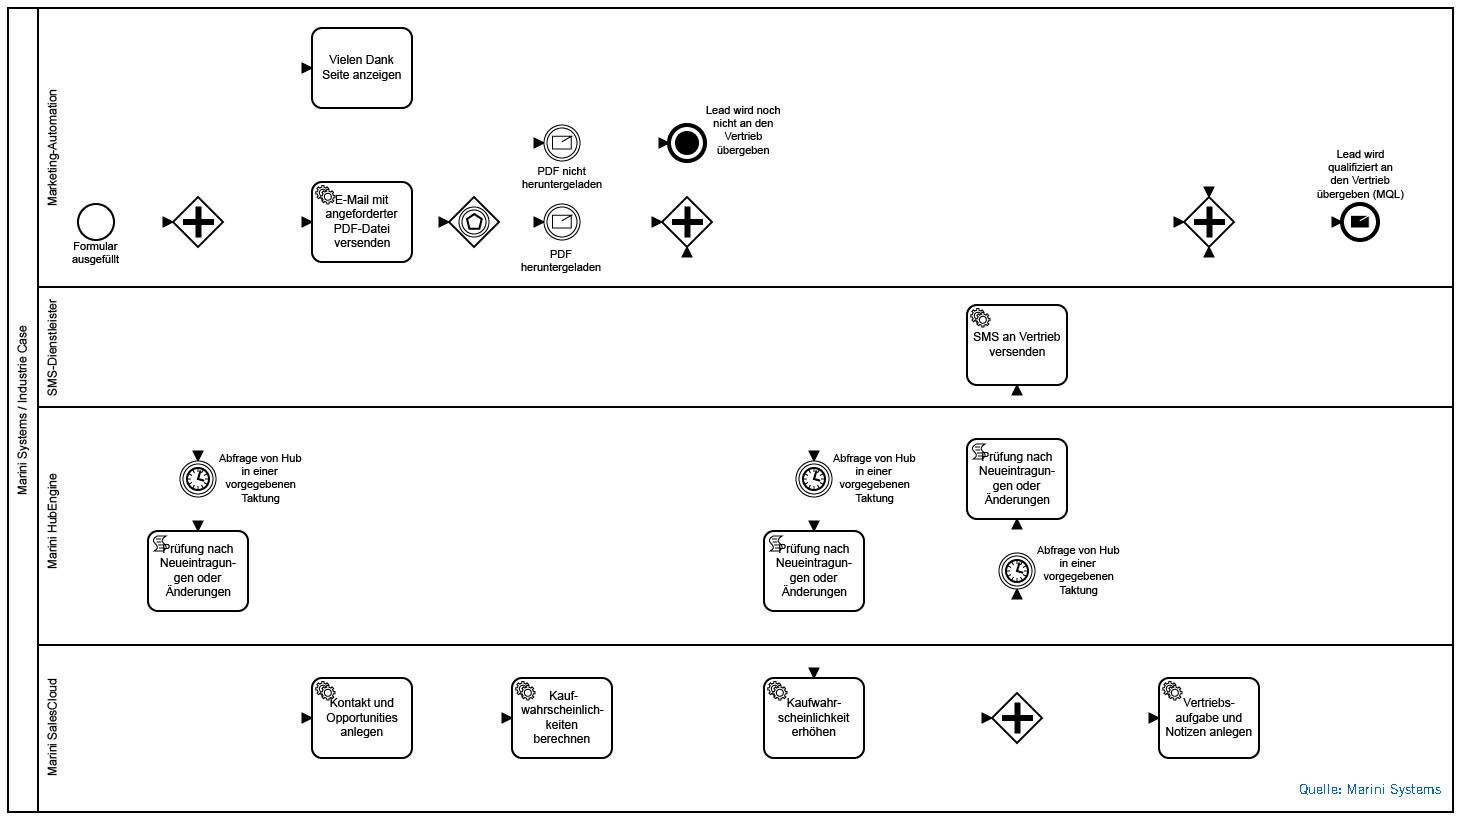 Grafik_BPMN-Prozess_Industrie-Use-Case